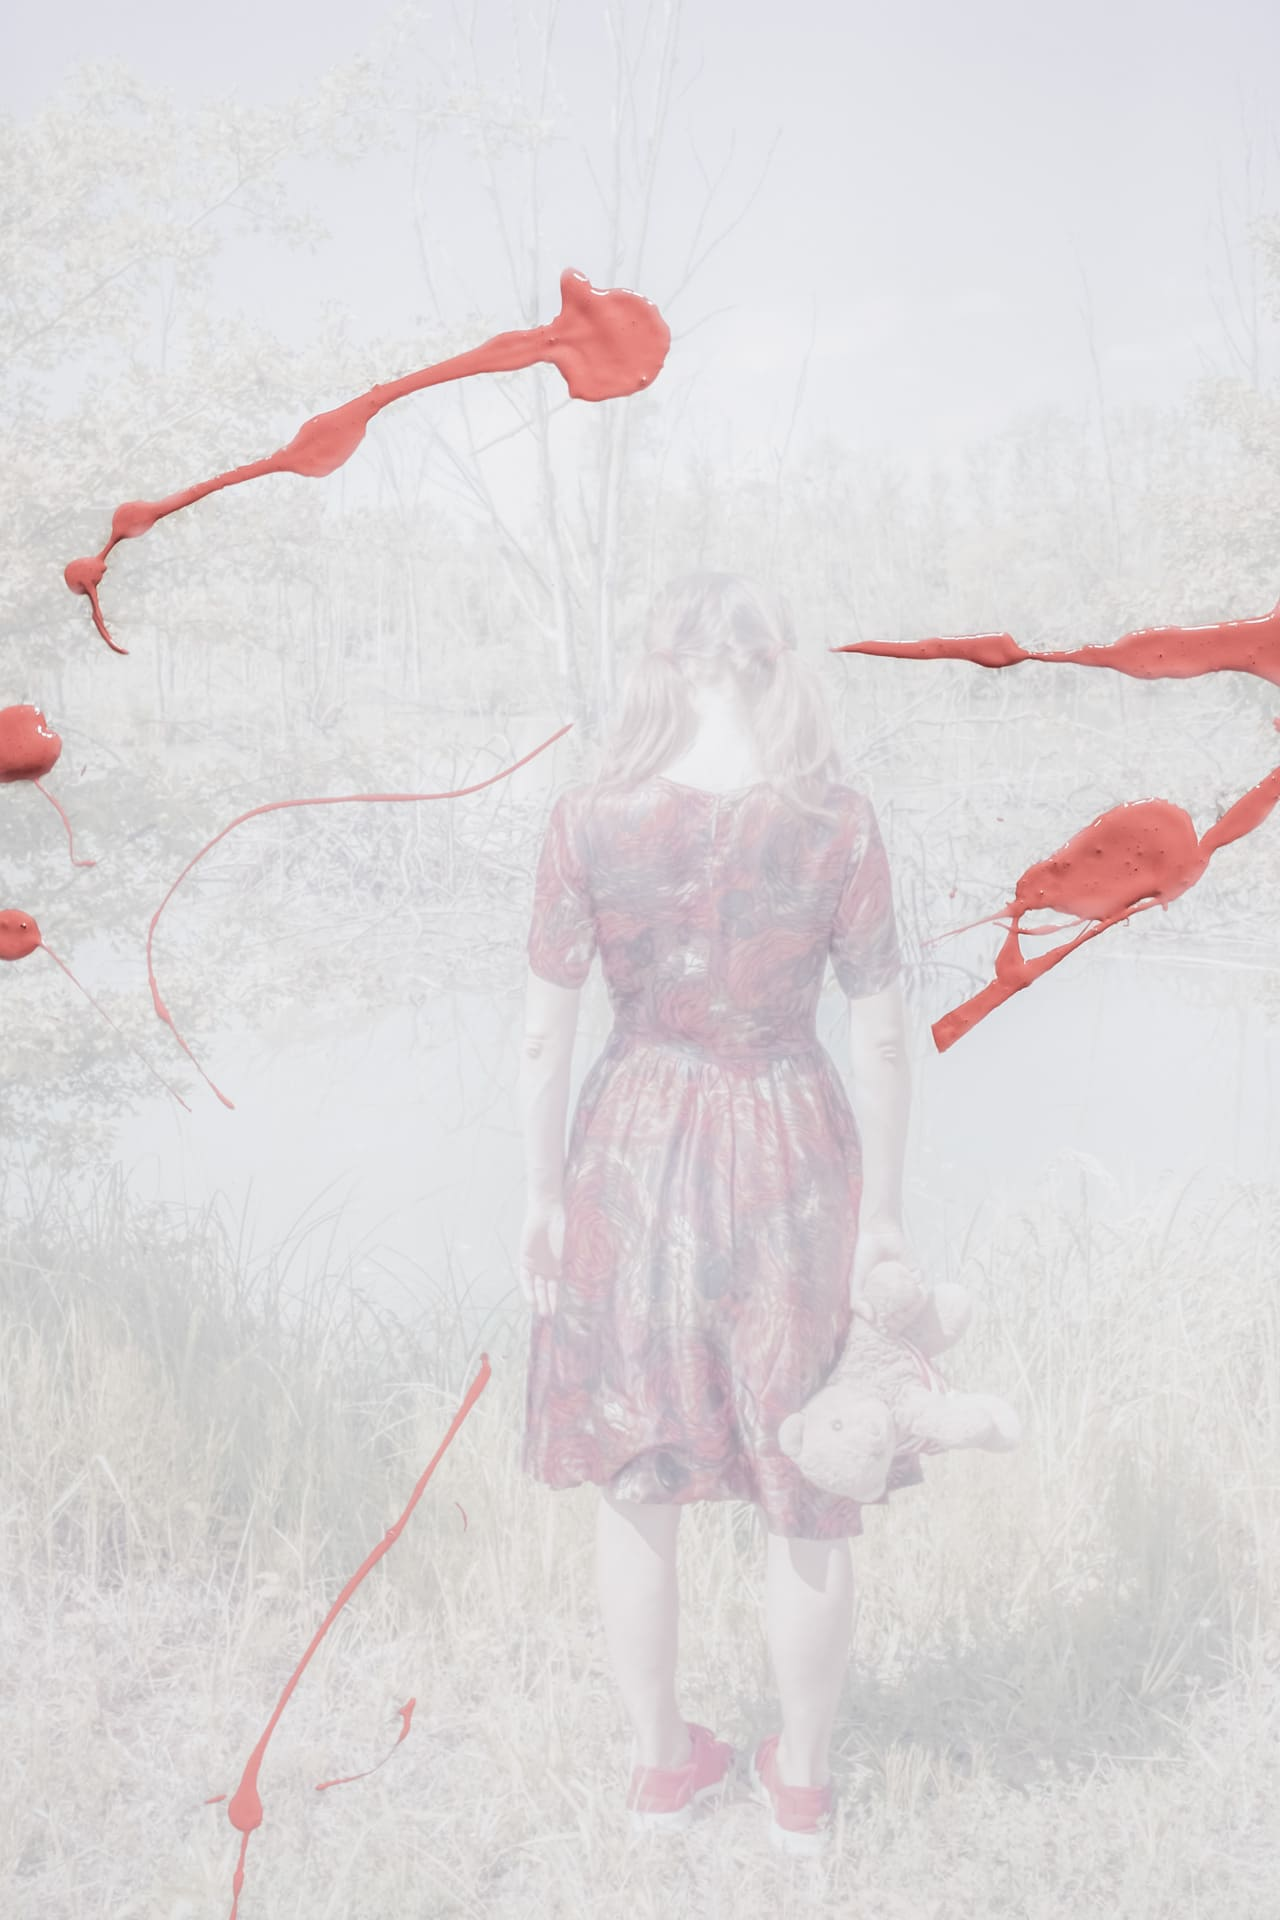 Fog-and-memories-2